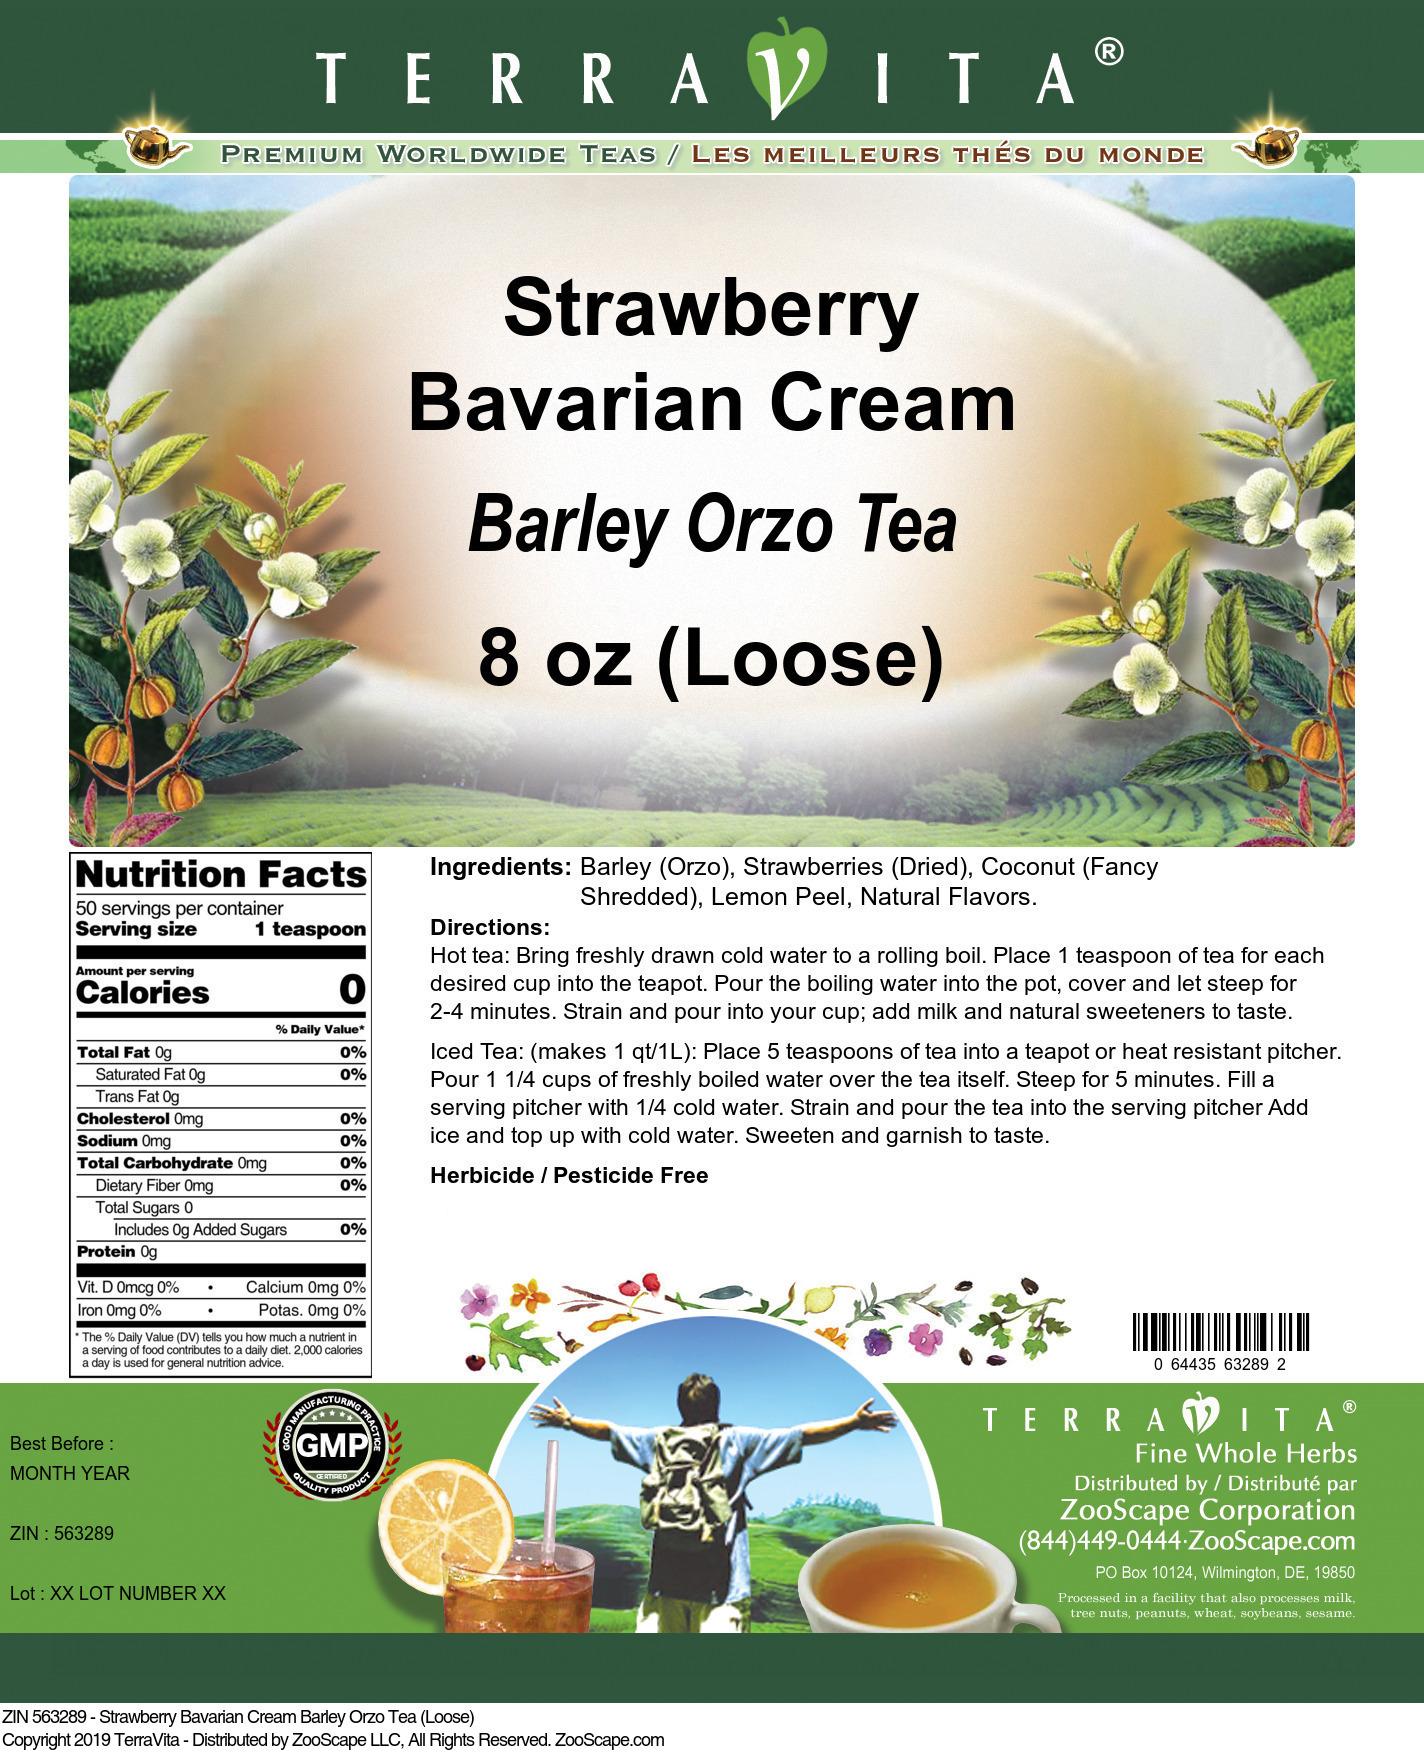 Strawberry Bavarian Cream Barley Orzo Tea (Loose)